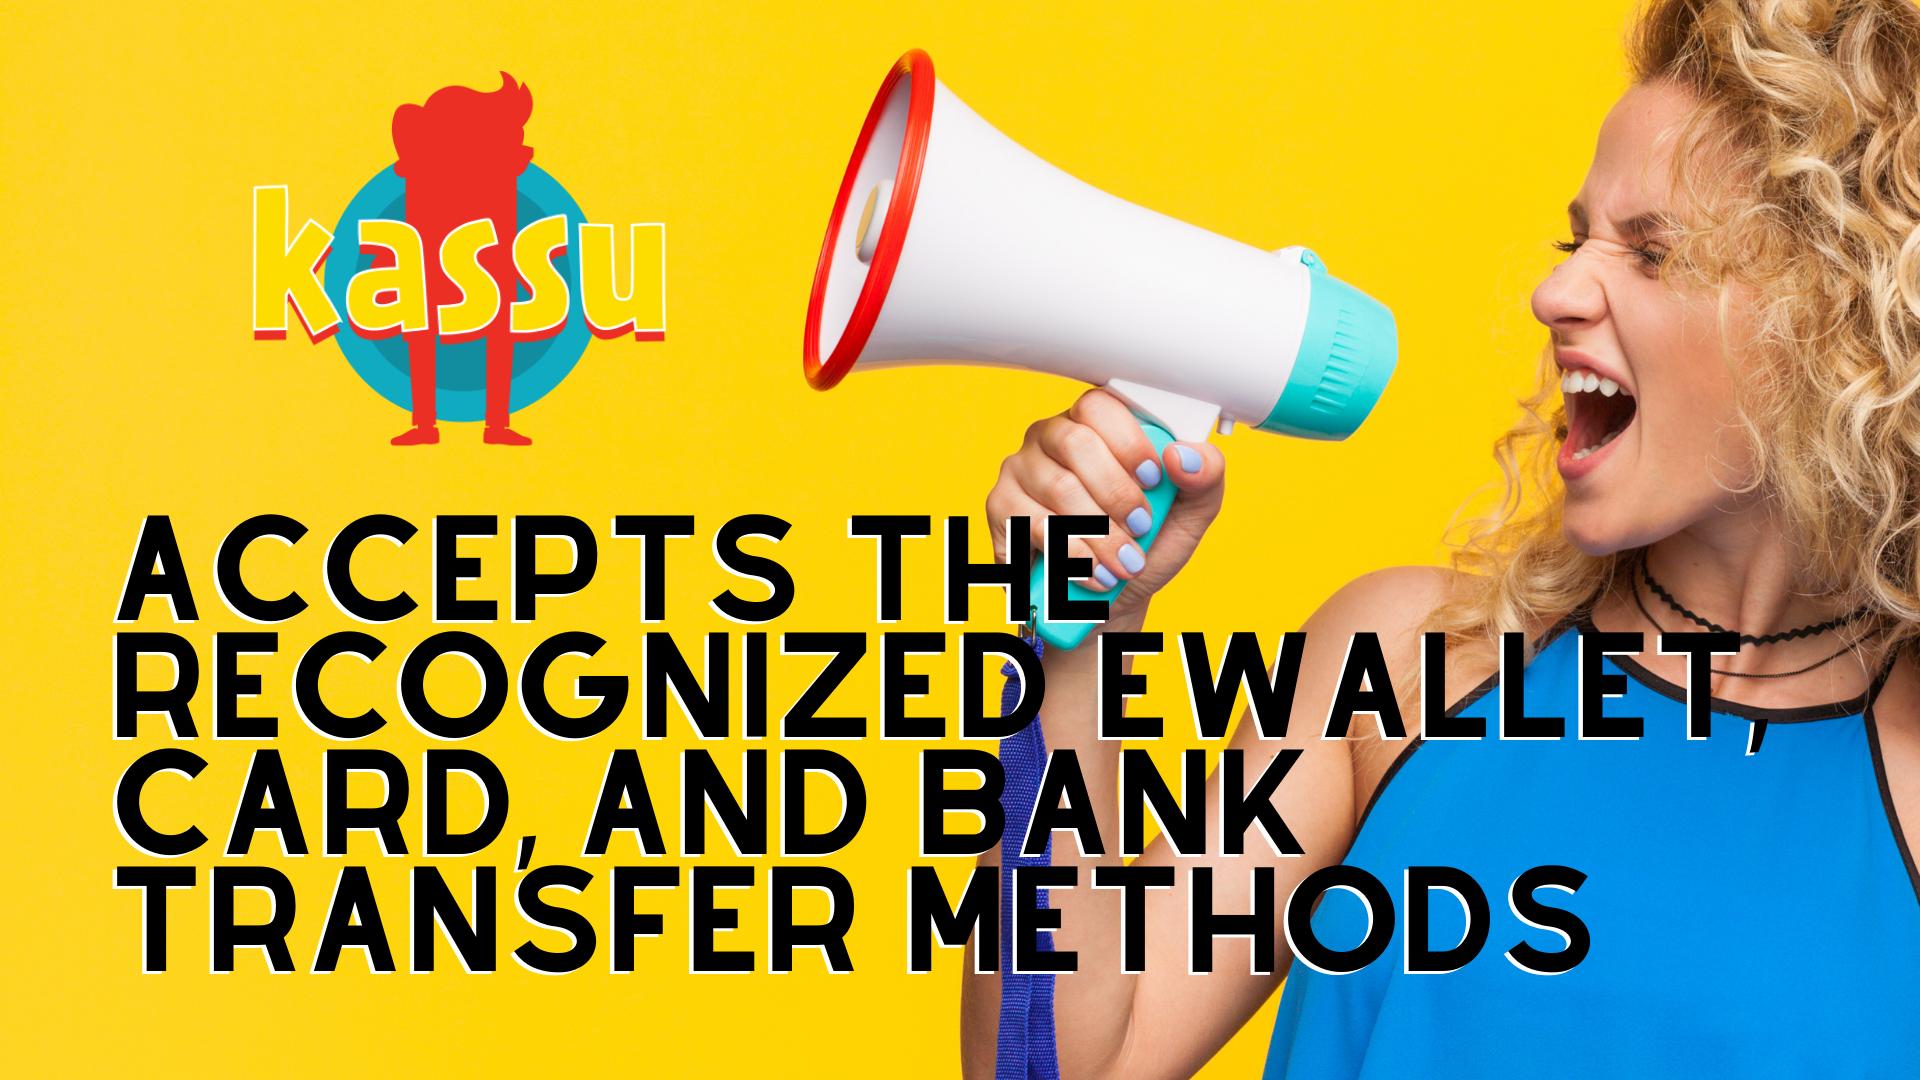 Kassu Casino Banking Options